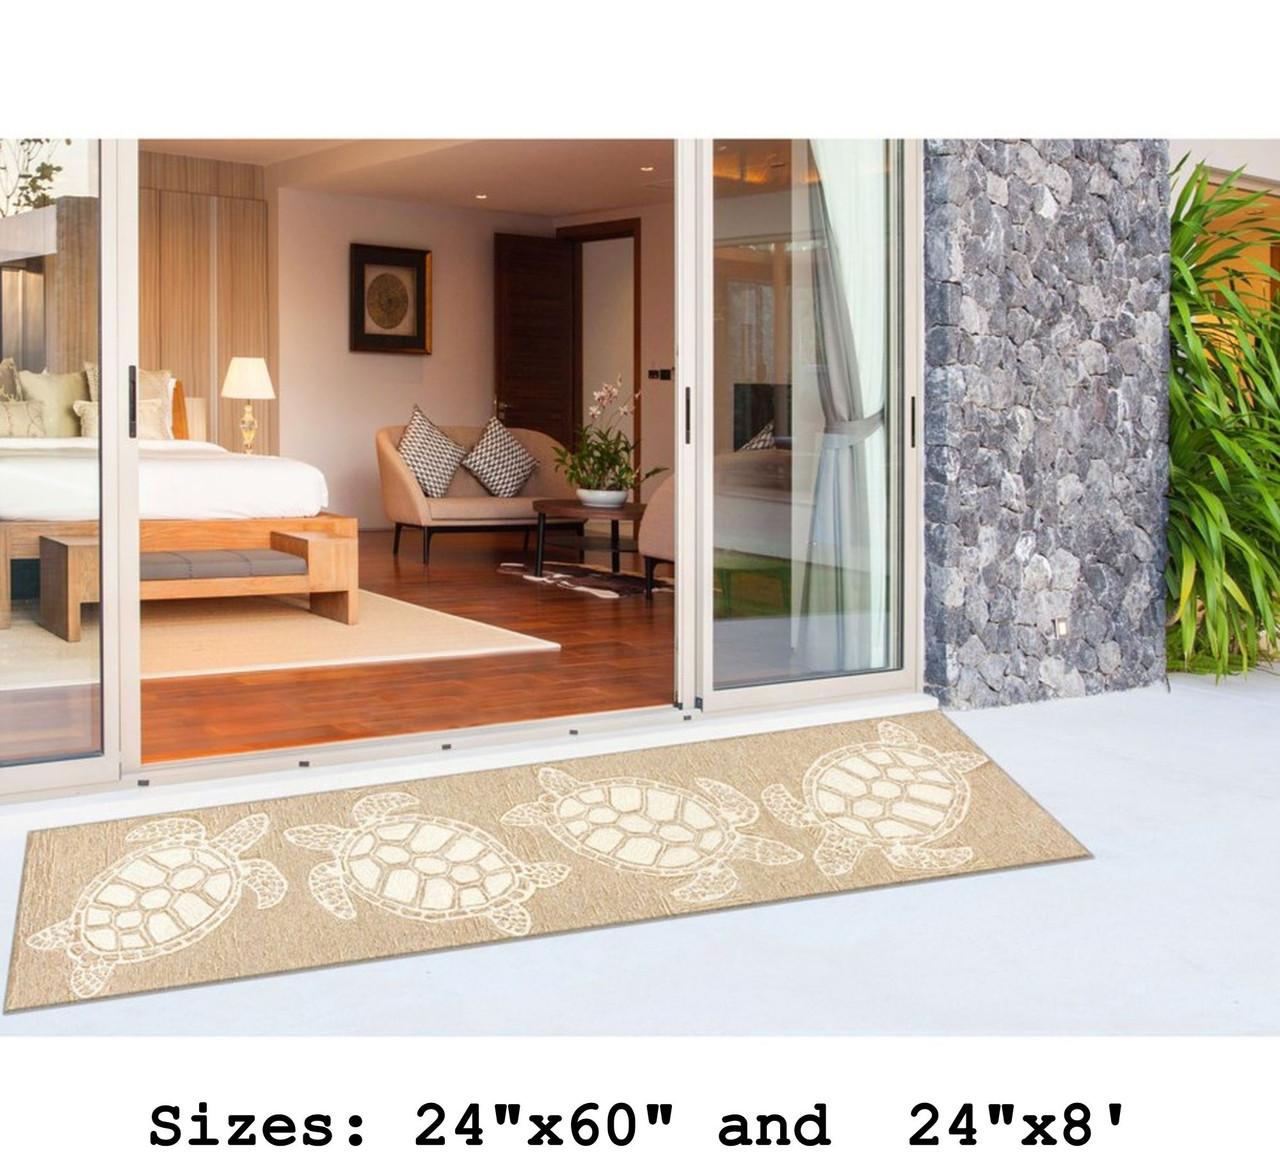 Capri Turtle Indoor/Outdoor Rug - Neutral - Large Runner Lifestyle